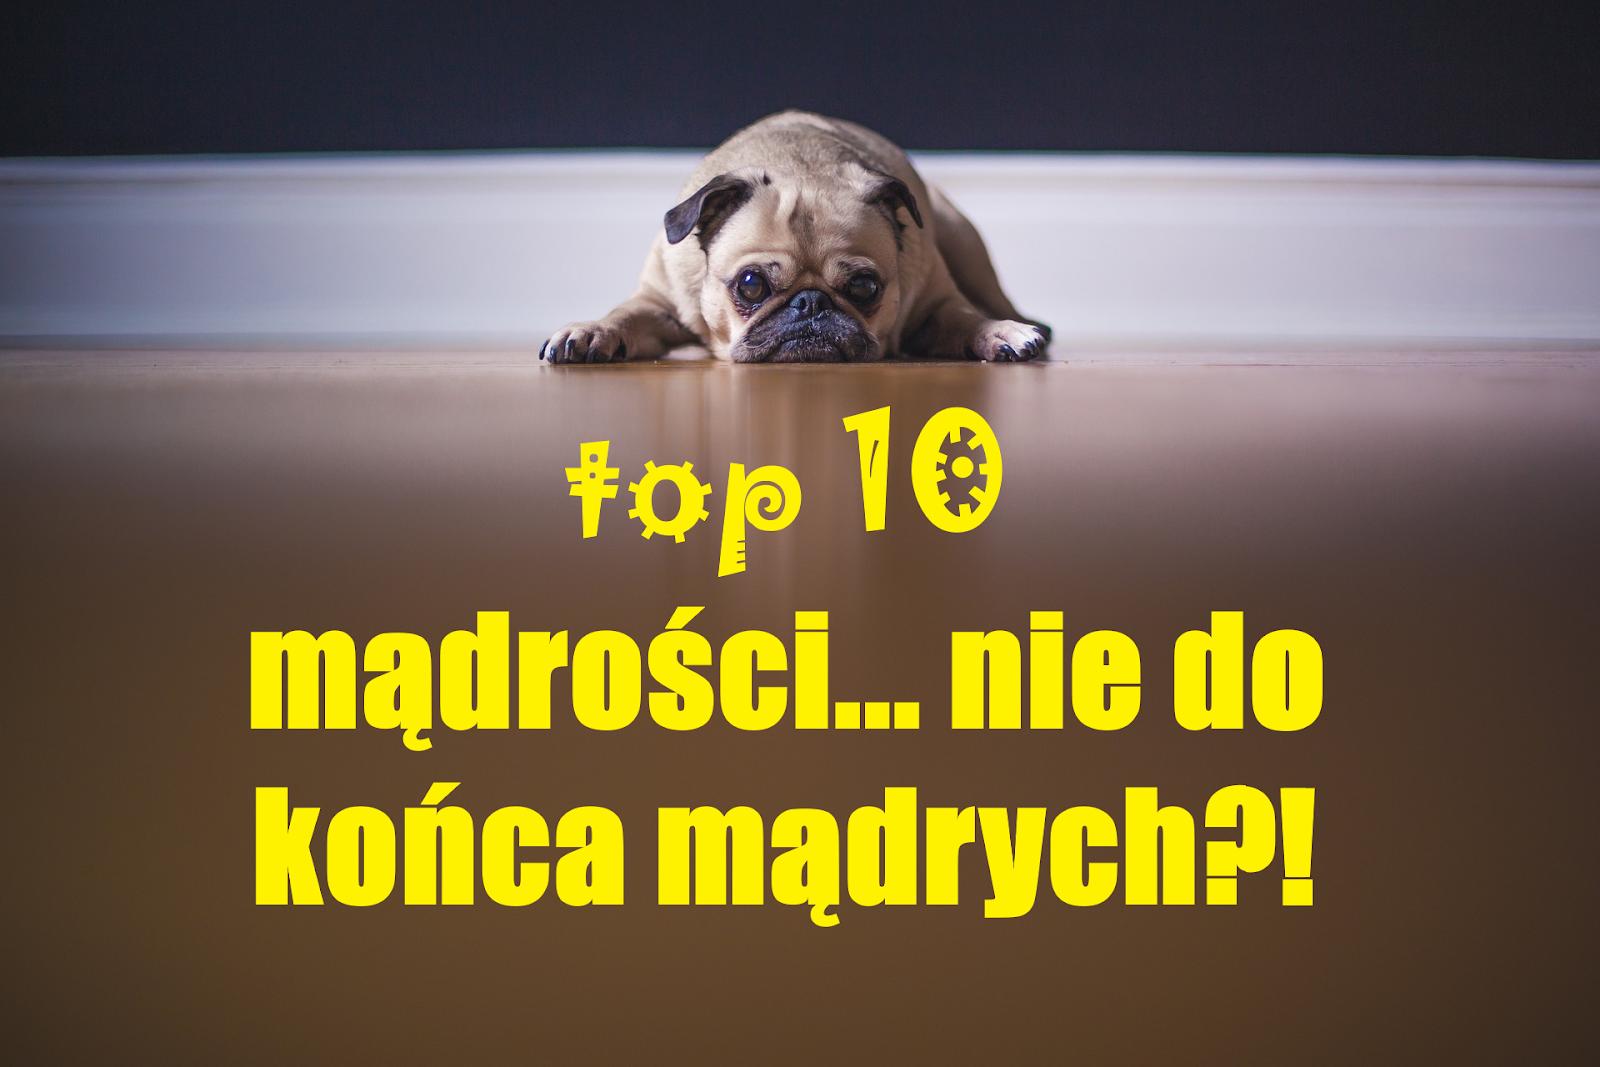 TOP 10 MADROSCI NIE DO KONCA MADRYCH